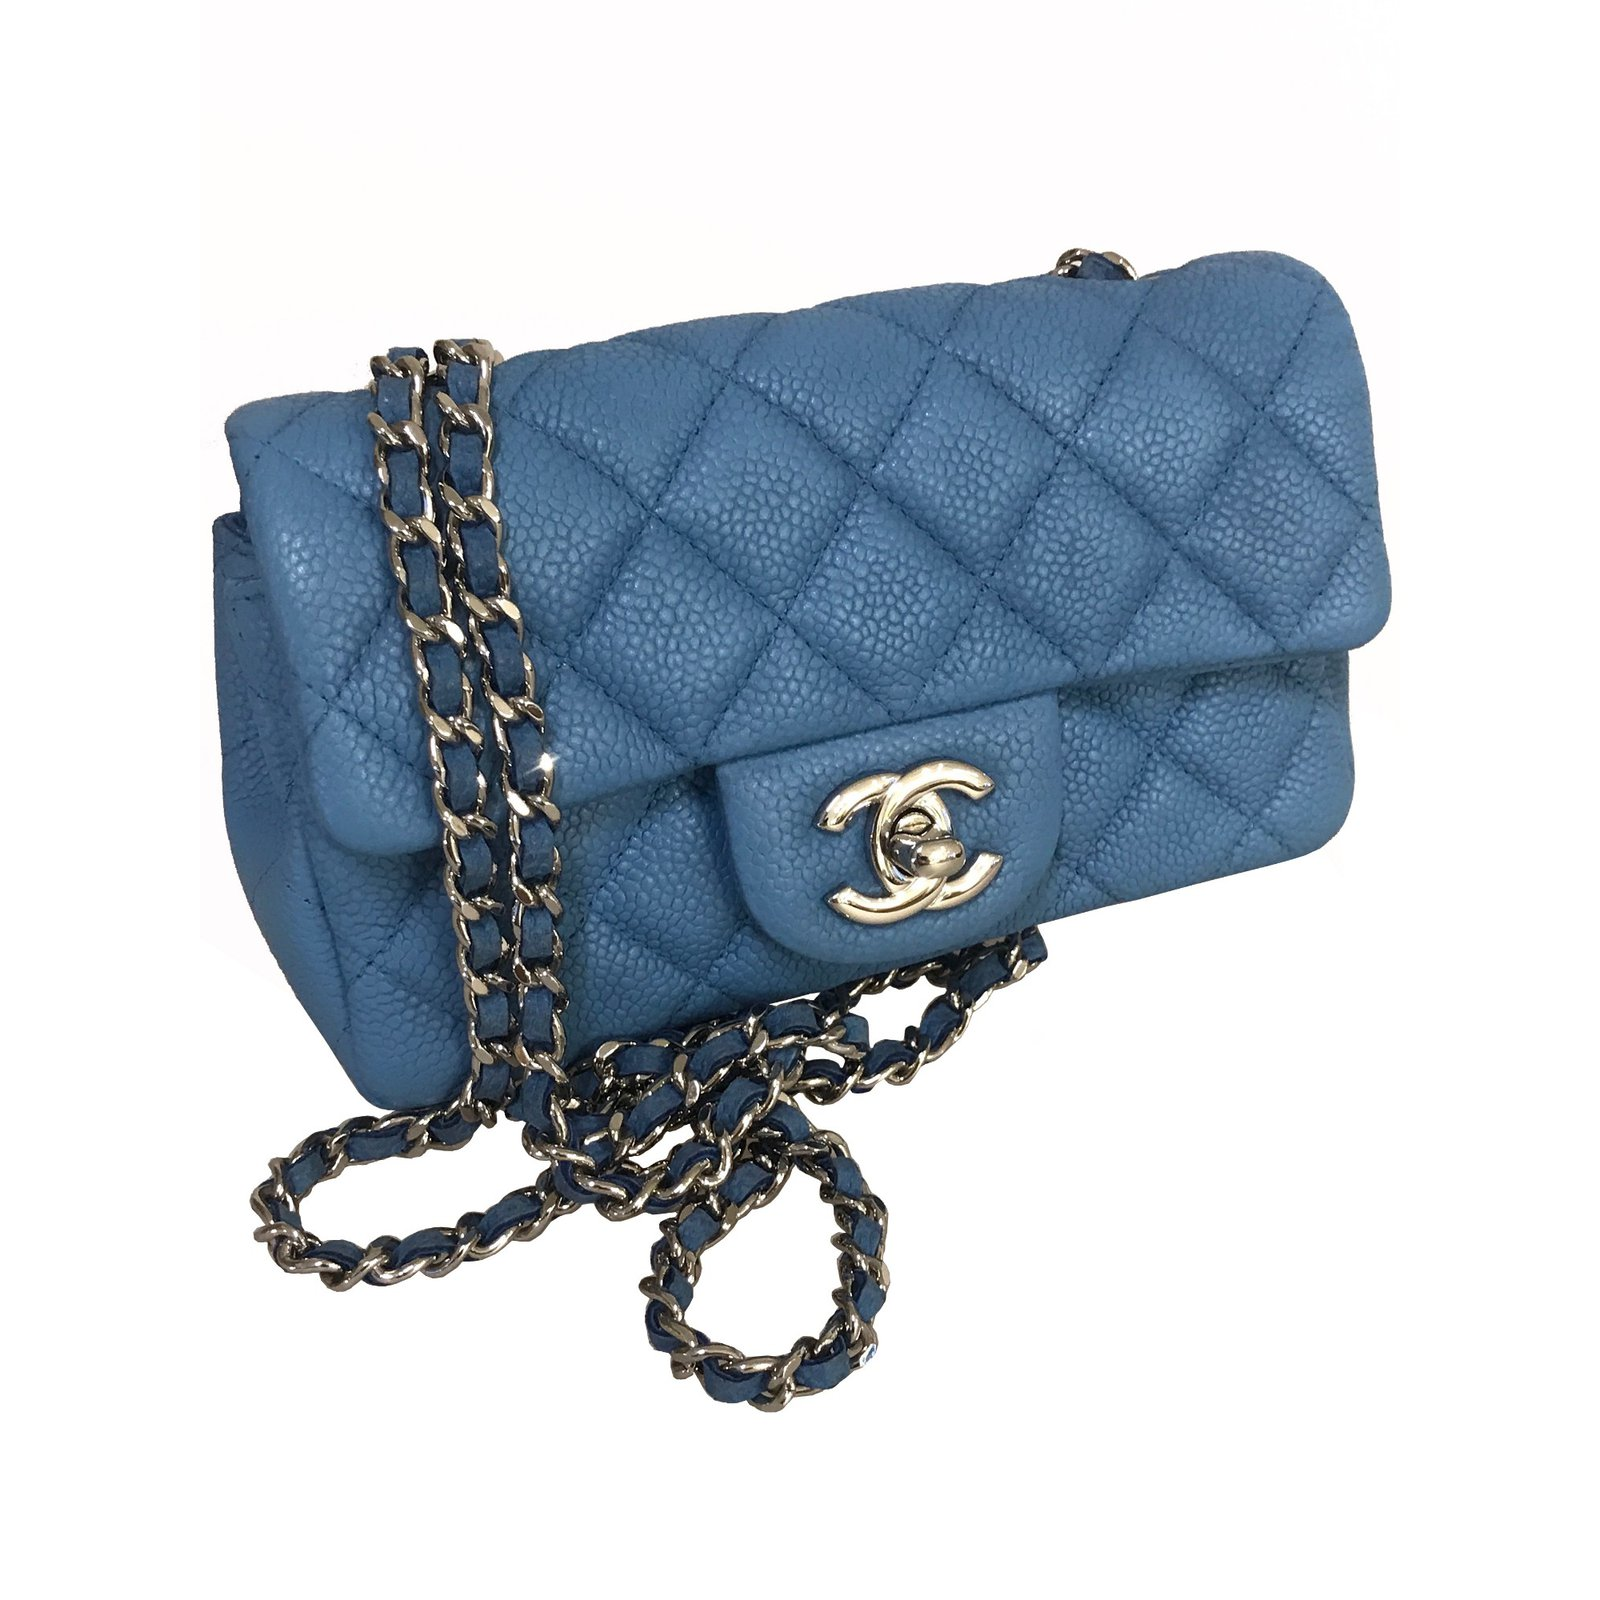 1f13d63bedab Chanel caviar timeless classic flap handbags leather light blue ref jpg  1600x1600 Mini flap timeless classic